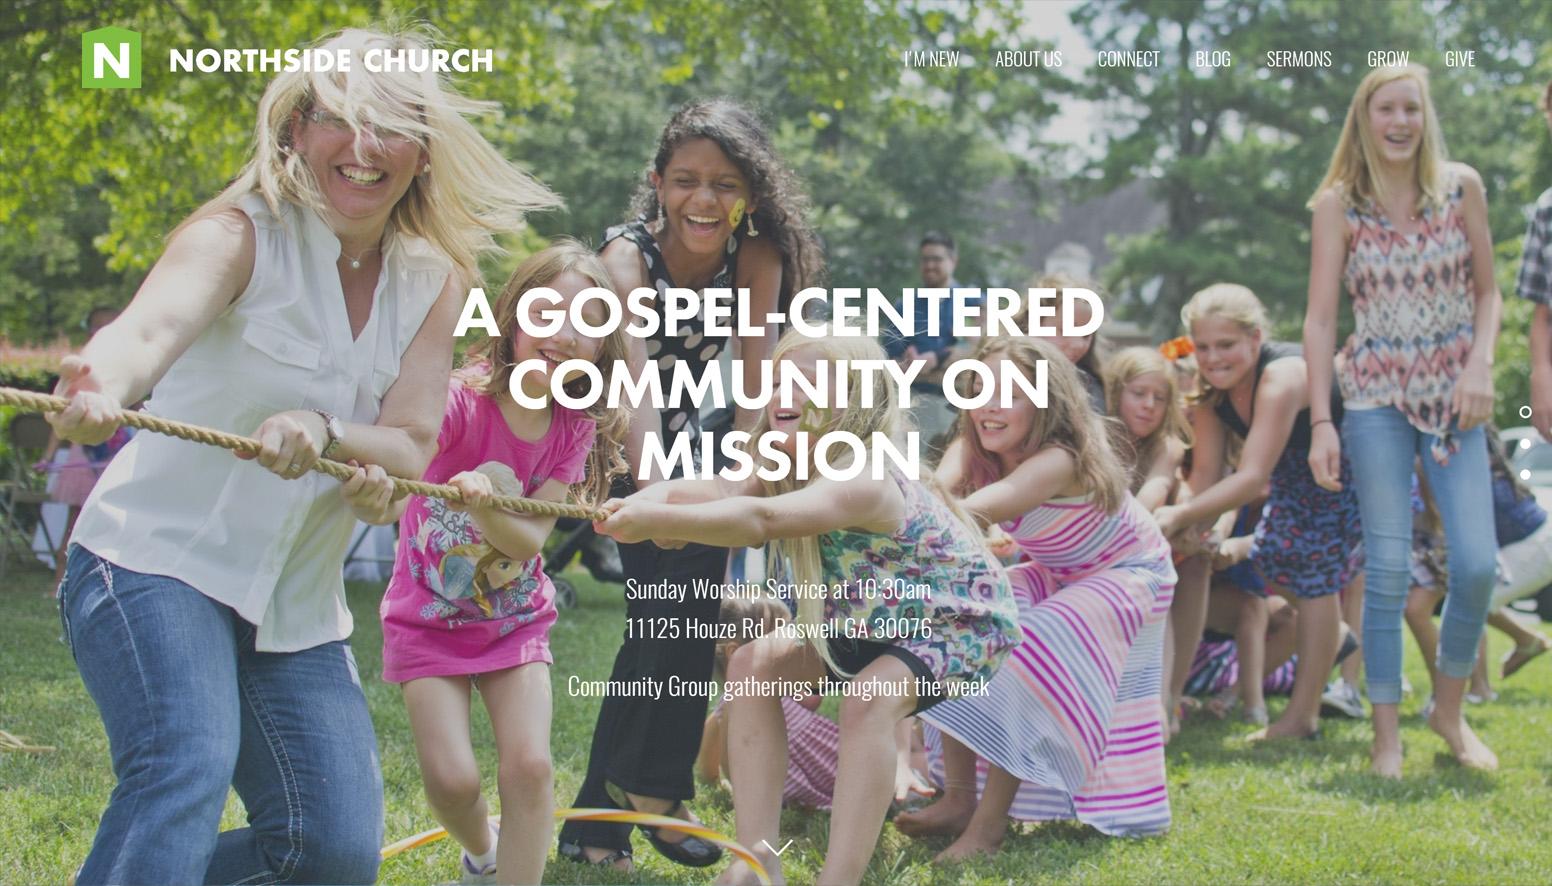 Northside Church - Website